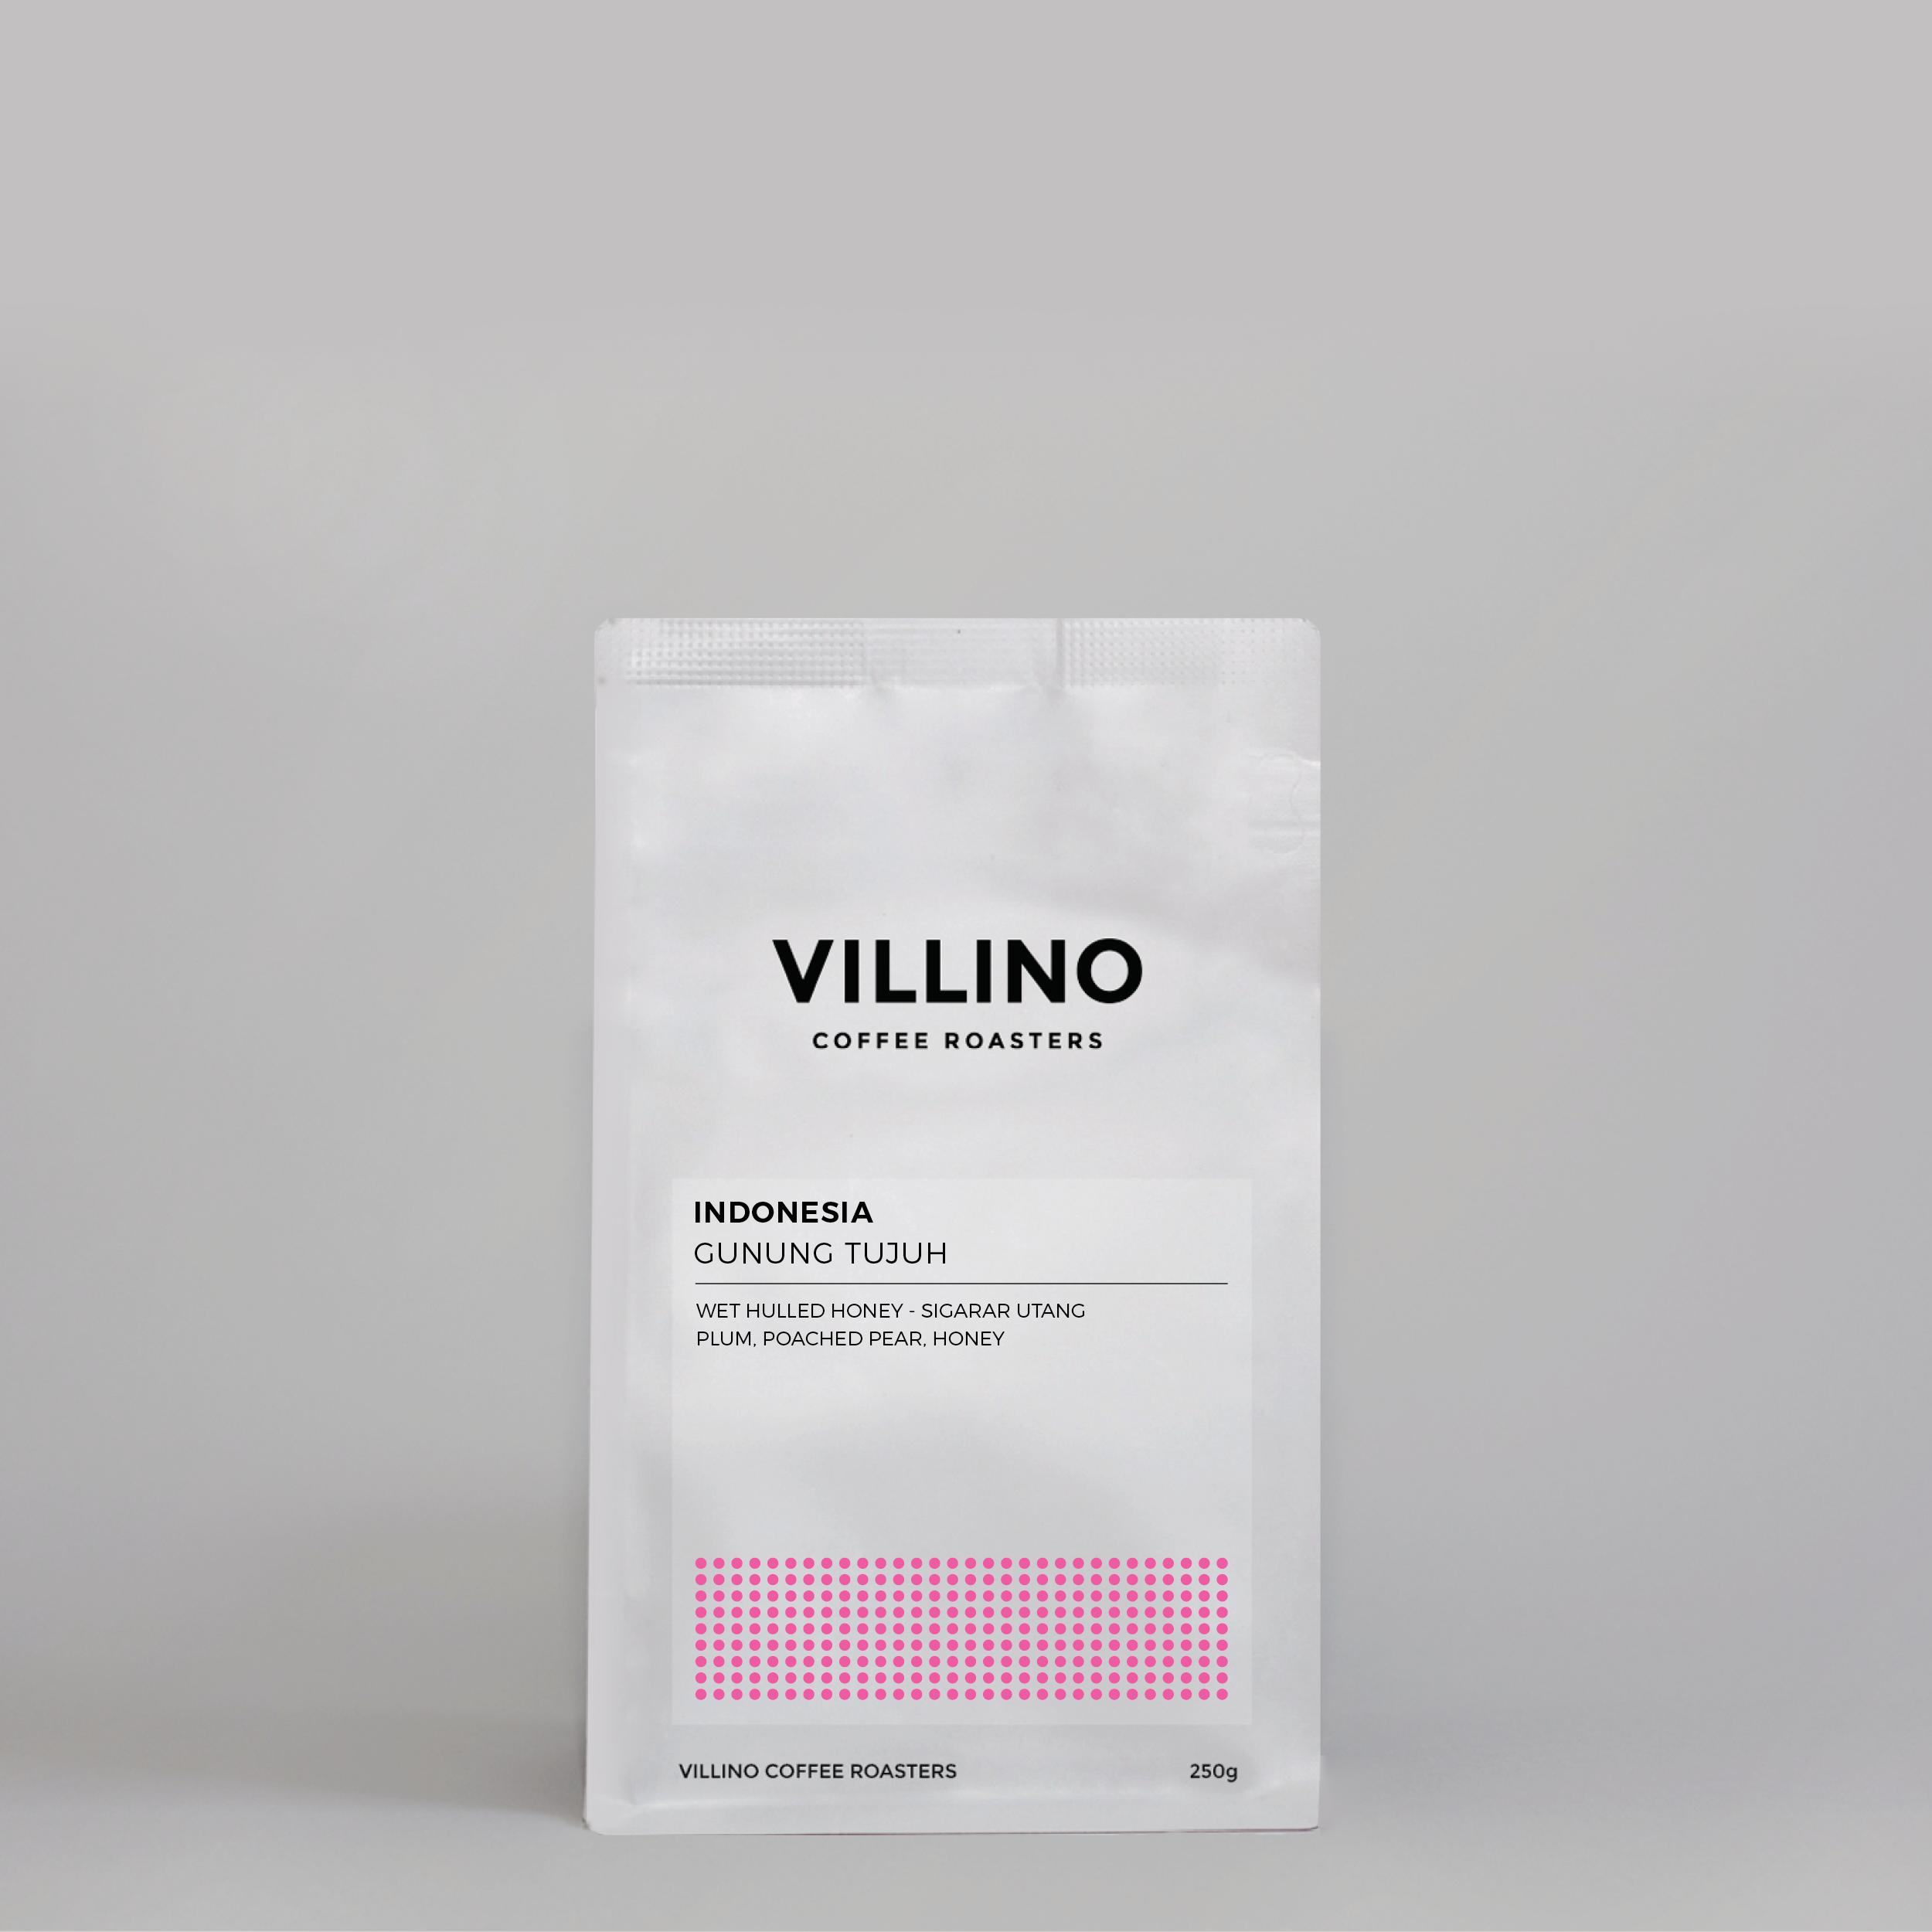 Villino_Retail Bag Templates_600x600px2.png